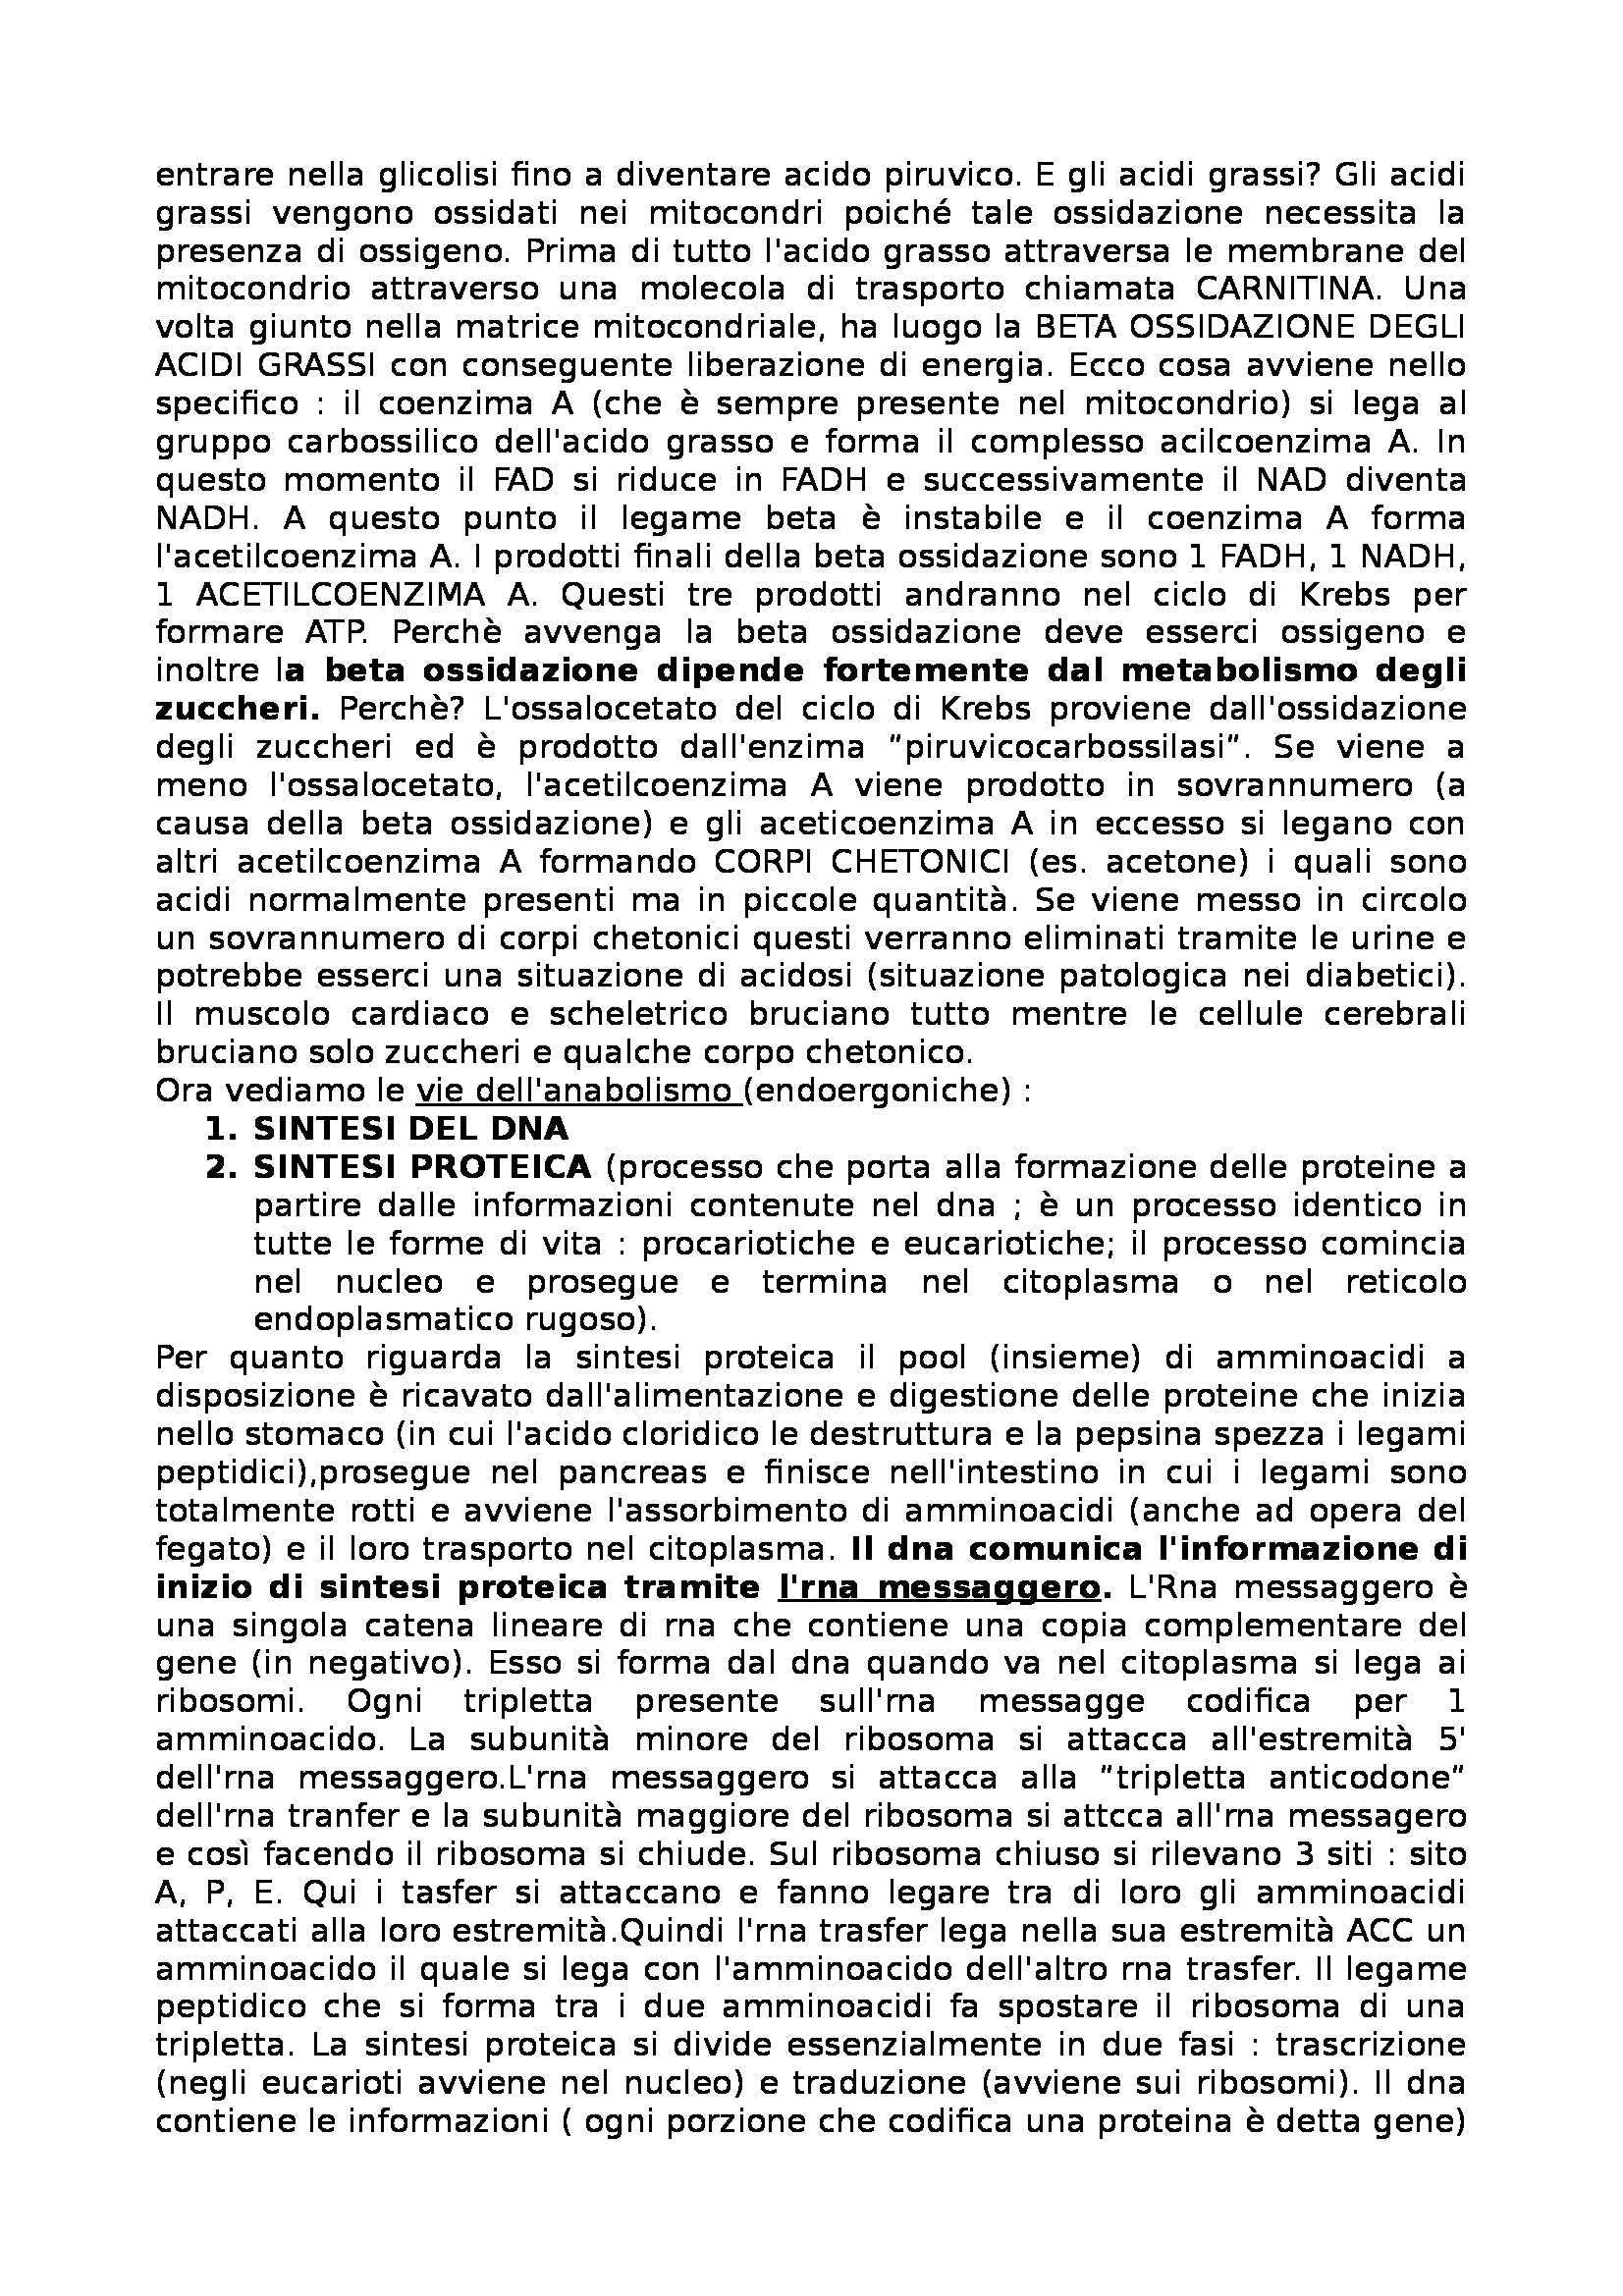 Biochimica - Appunti Pag. 16